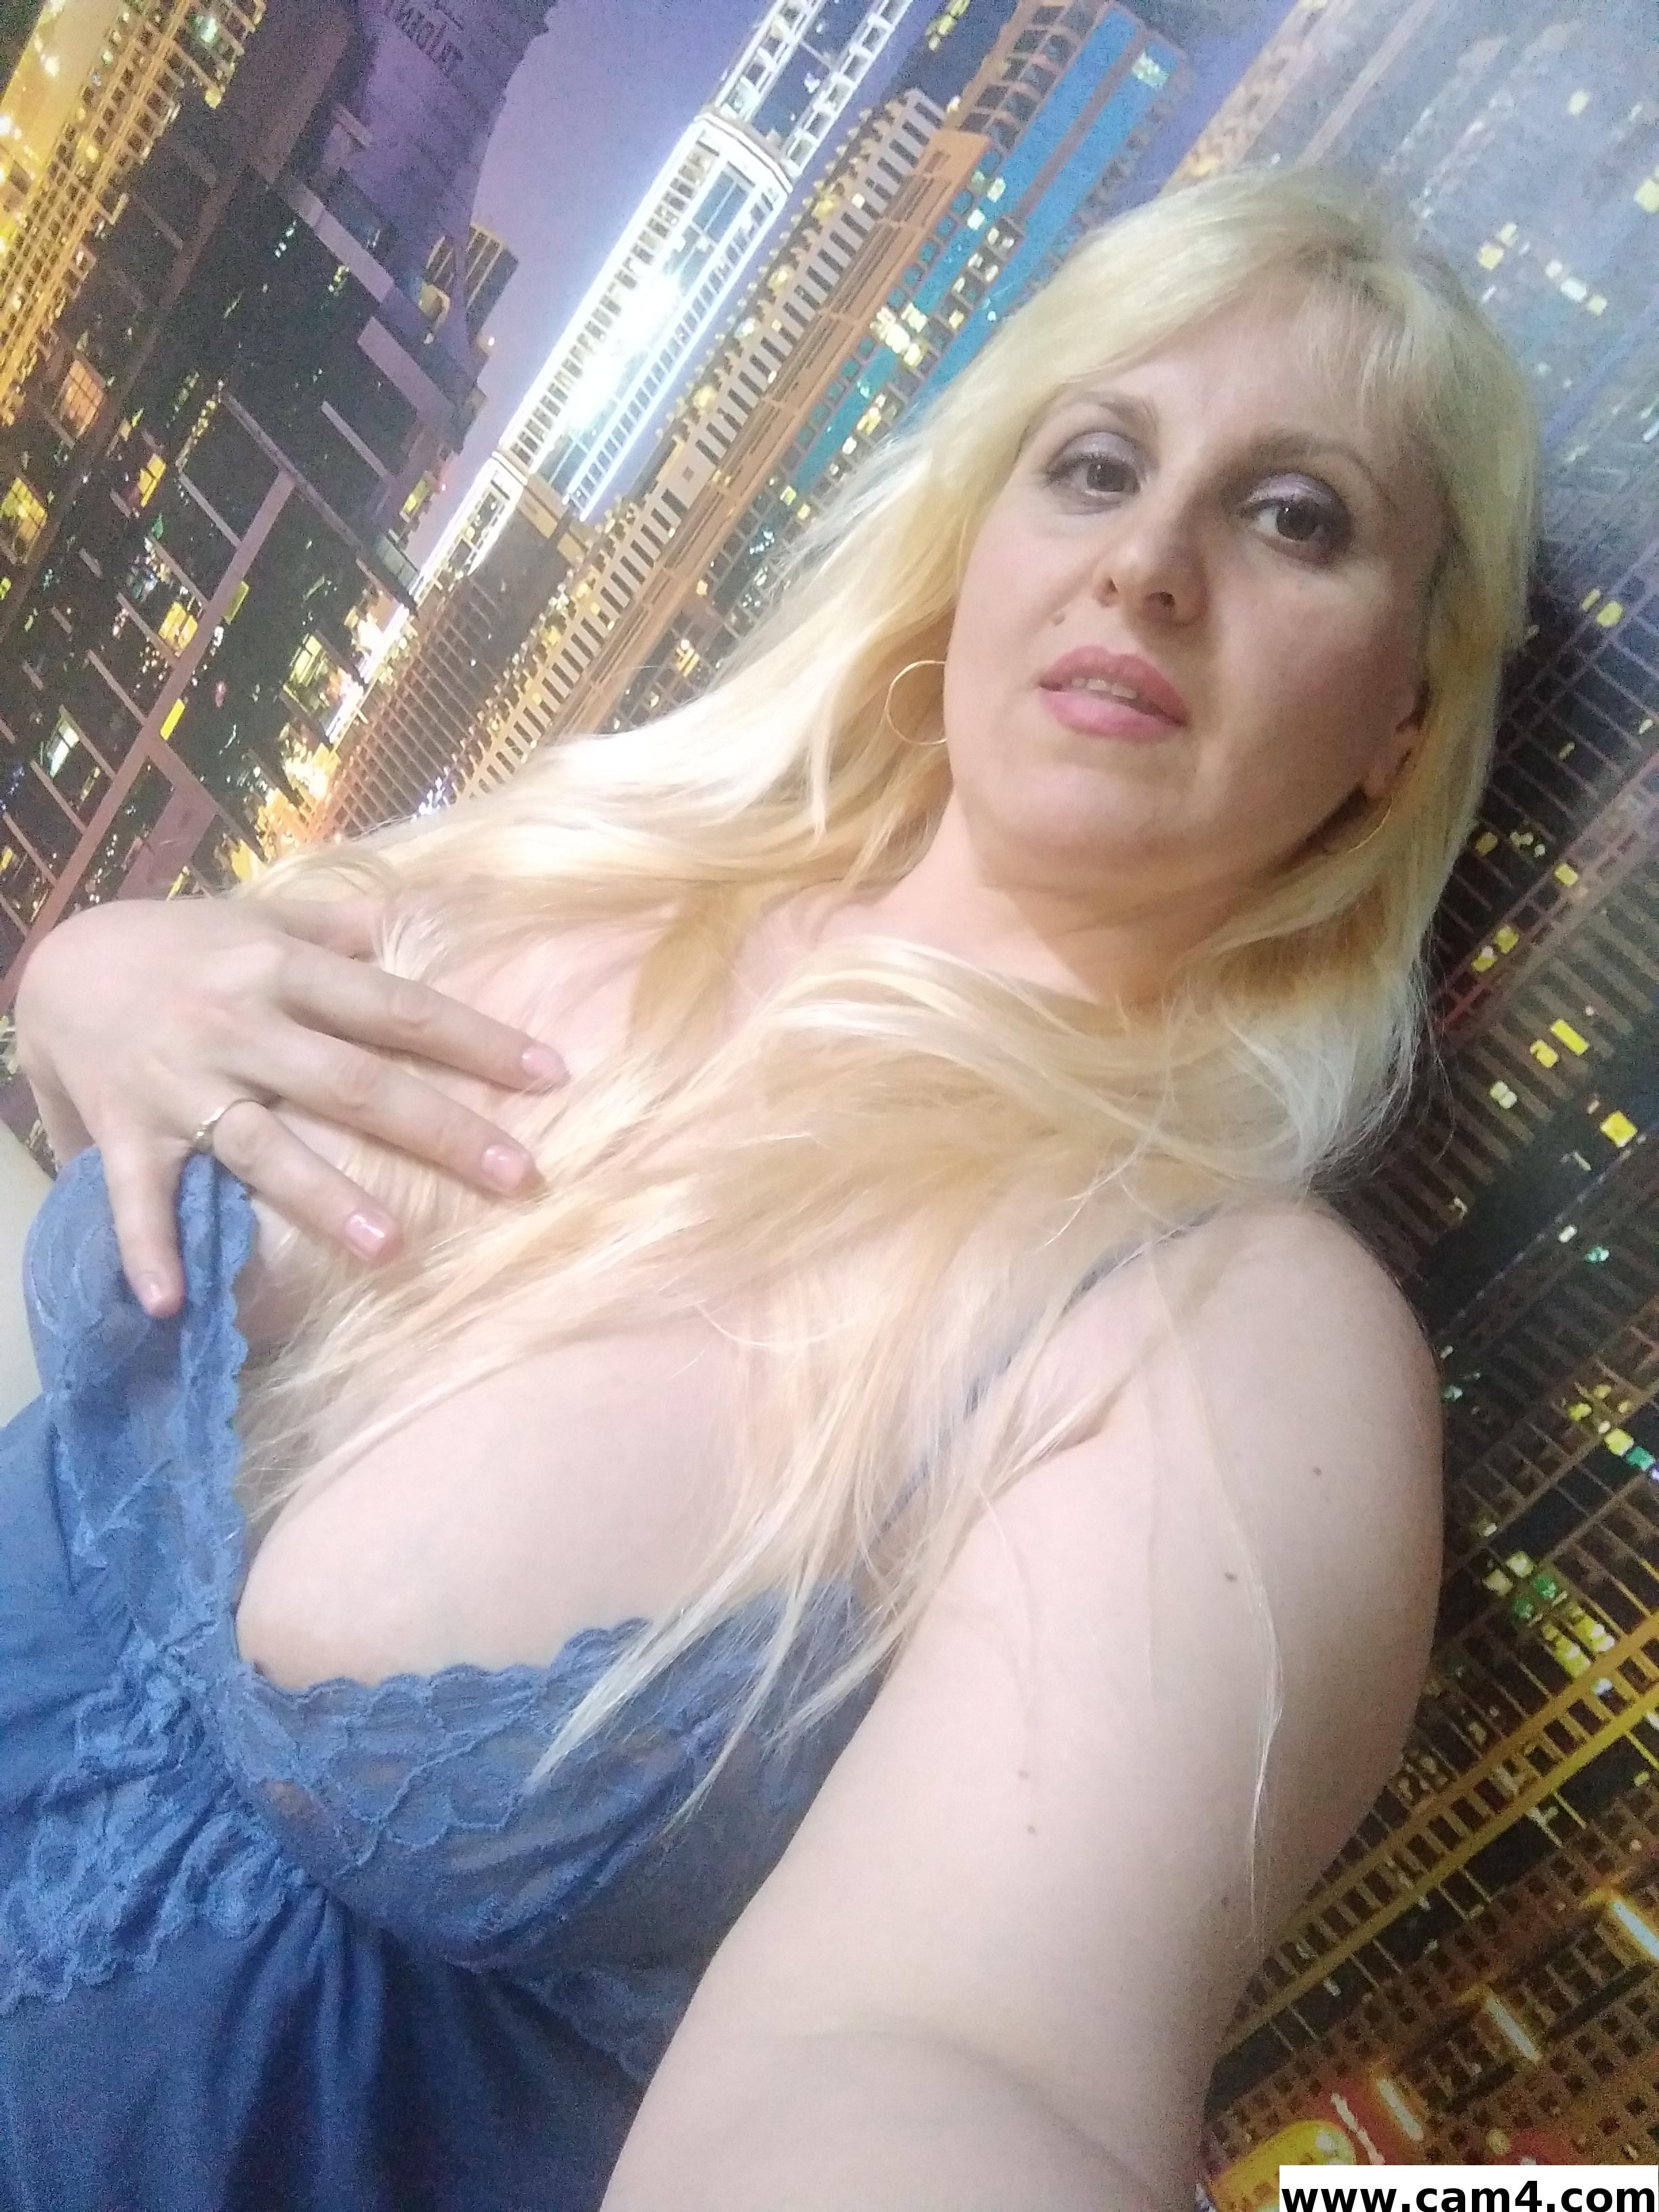 Blondabella?s=smkitquq6x5mwnkaraoffk+4h76qme127tcbsugrwum=